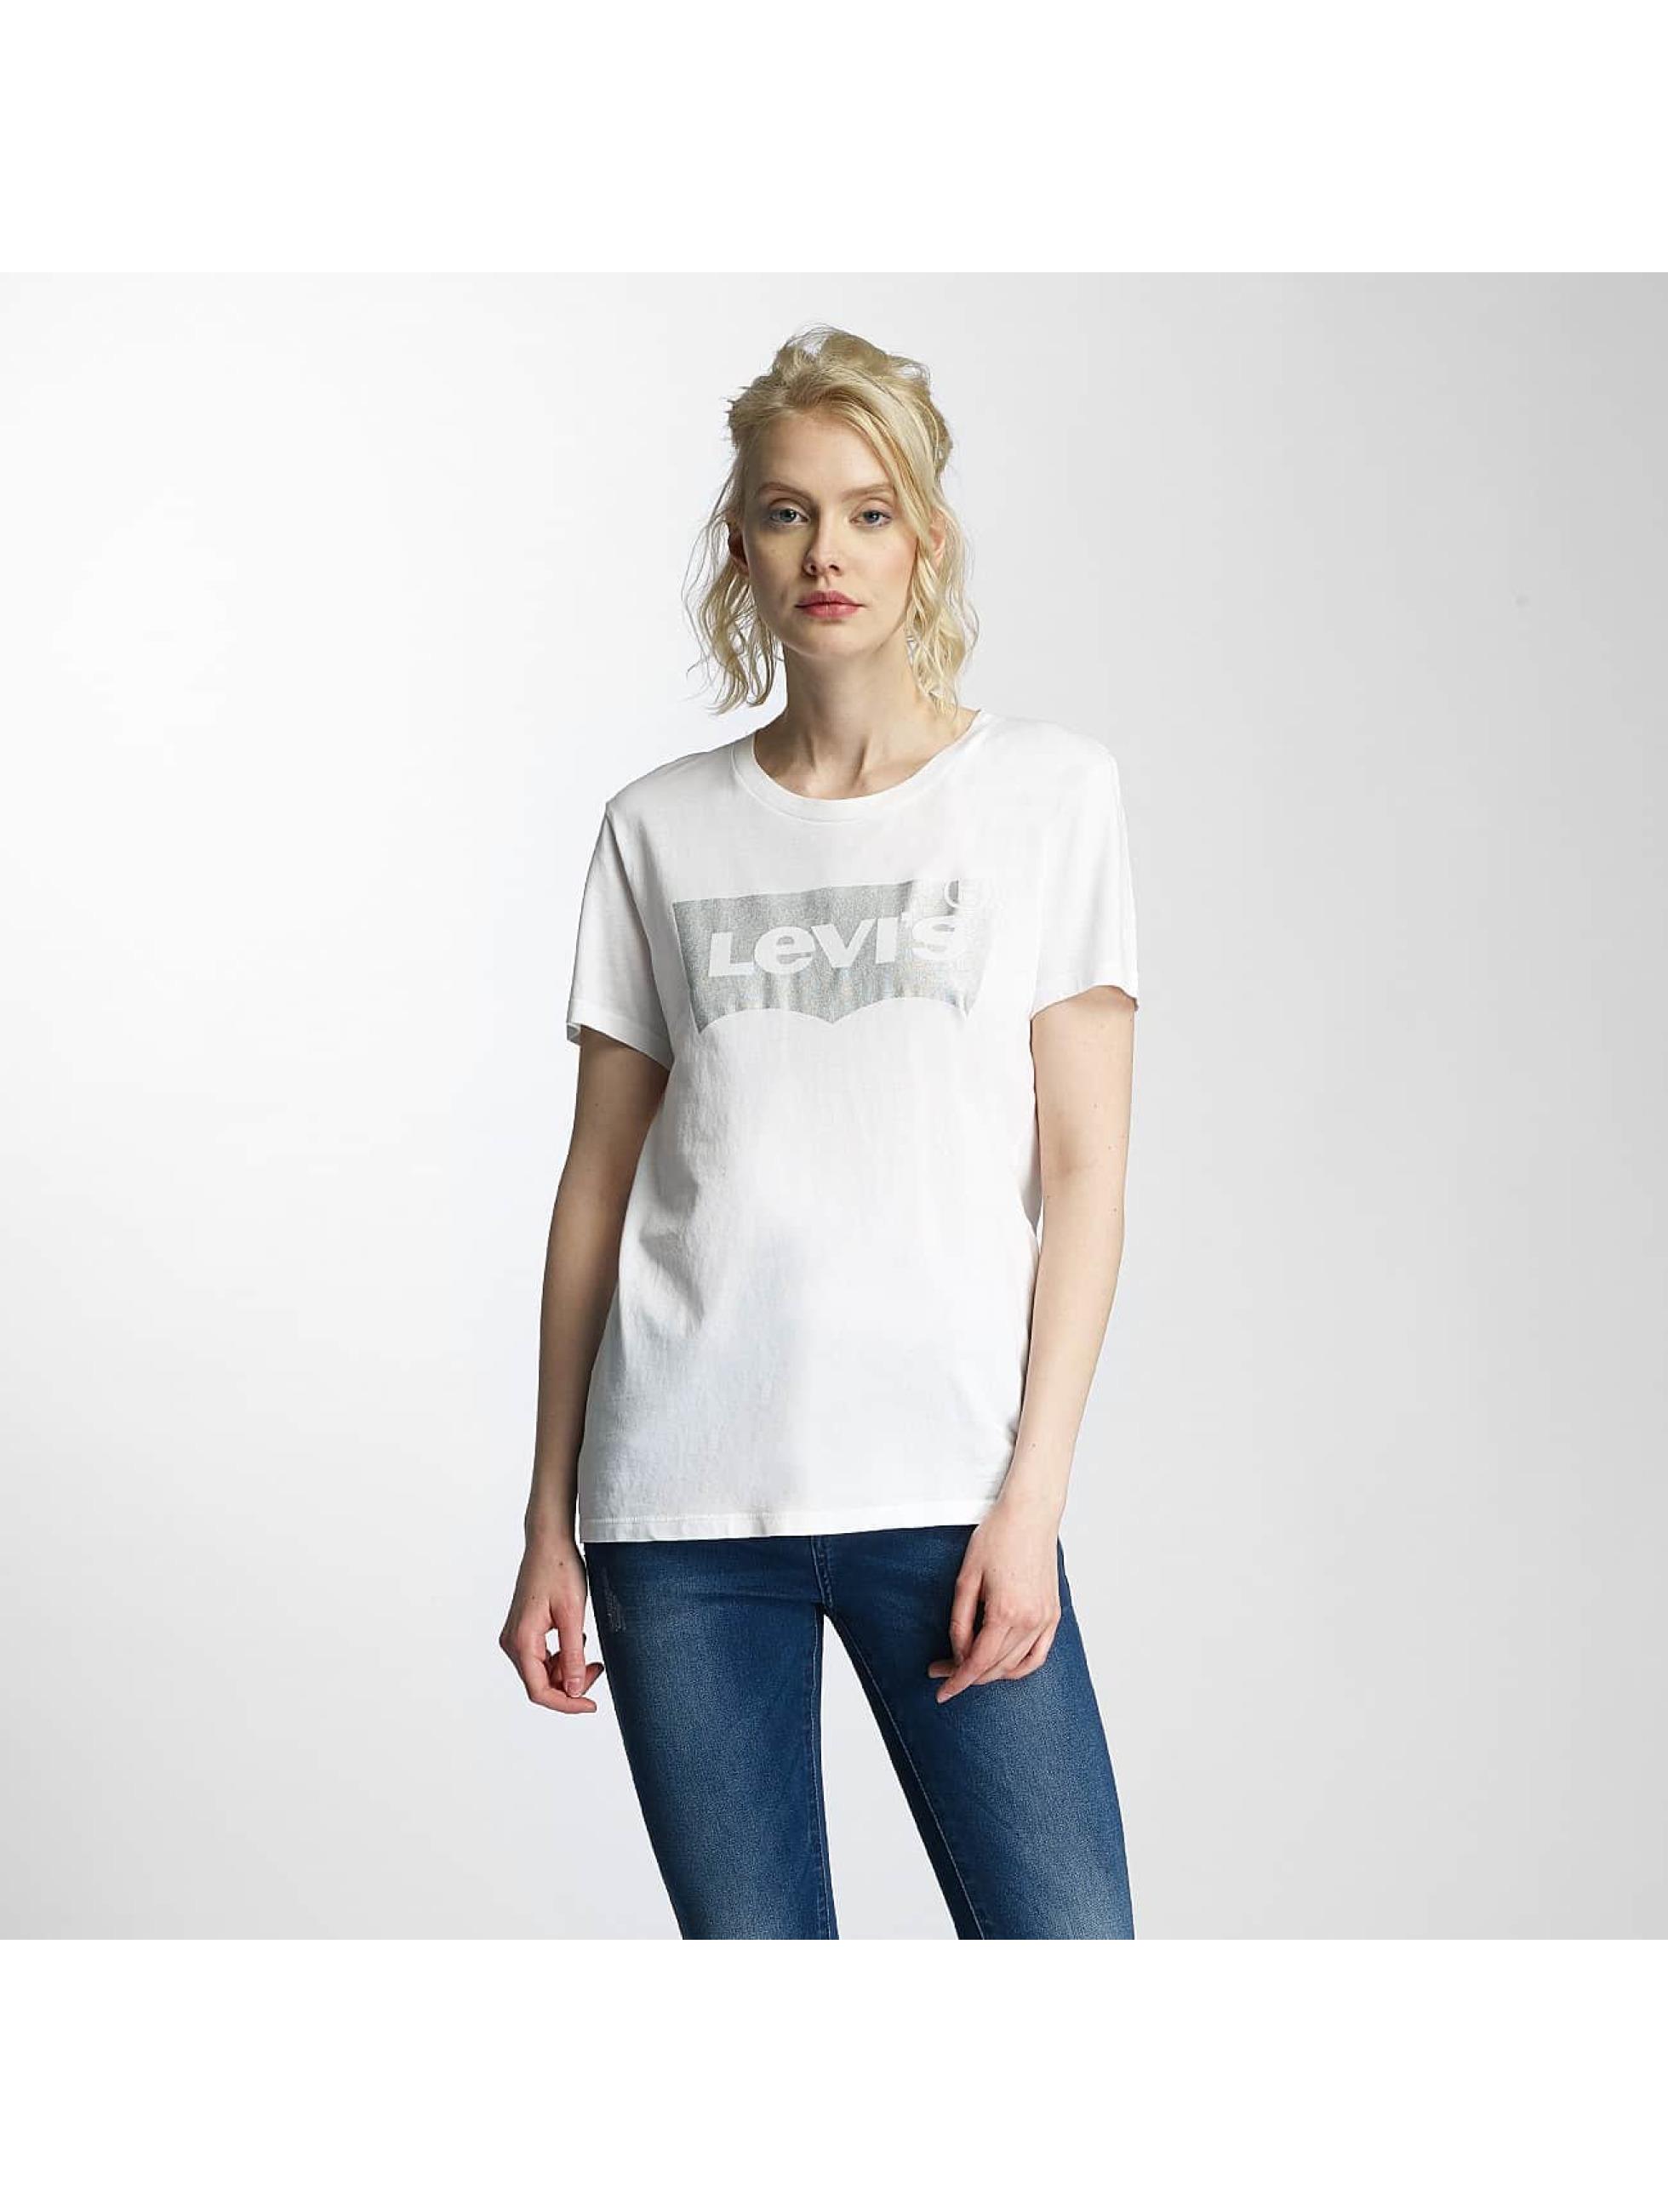 Levi's® T-Shirt Perfect white